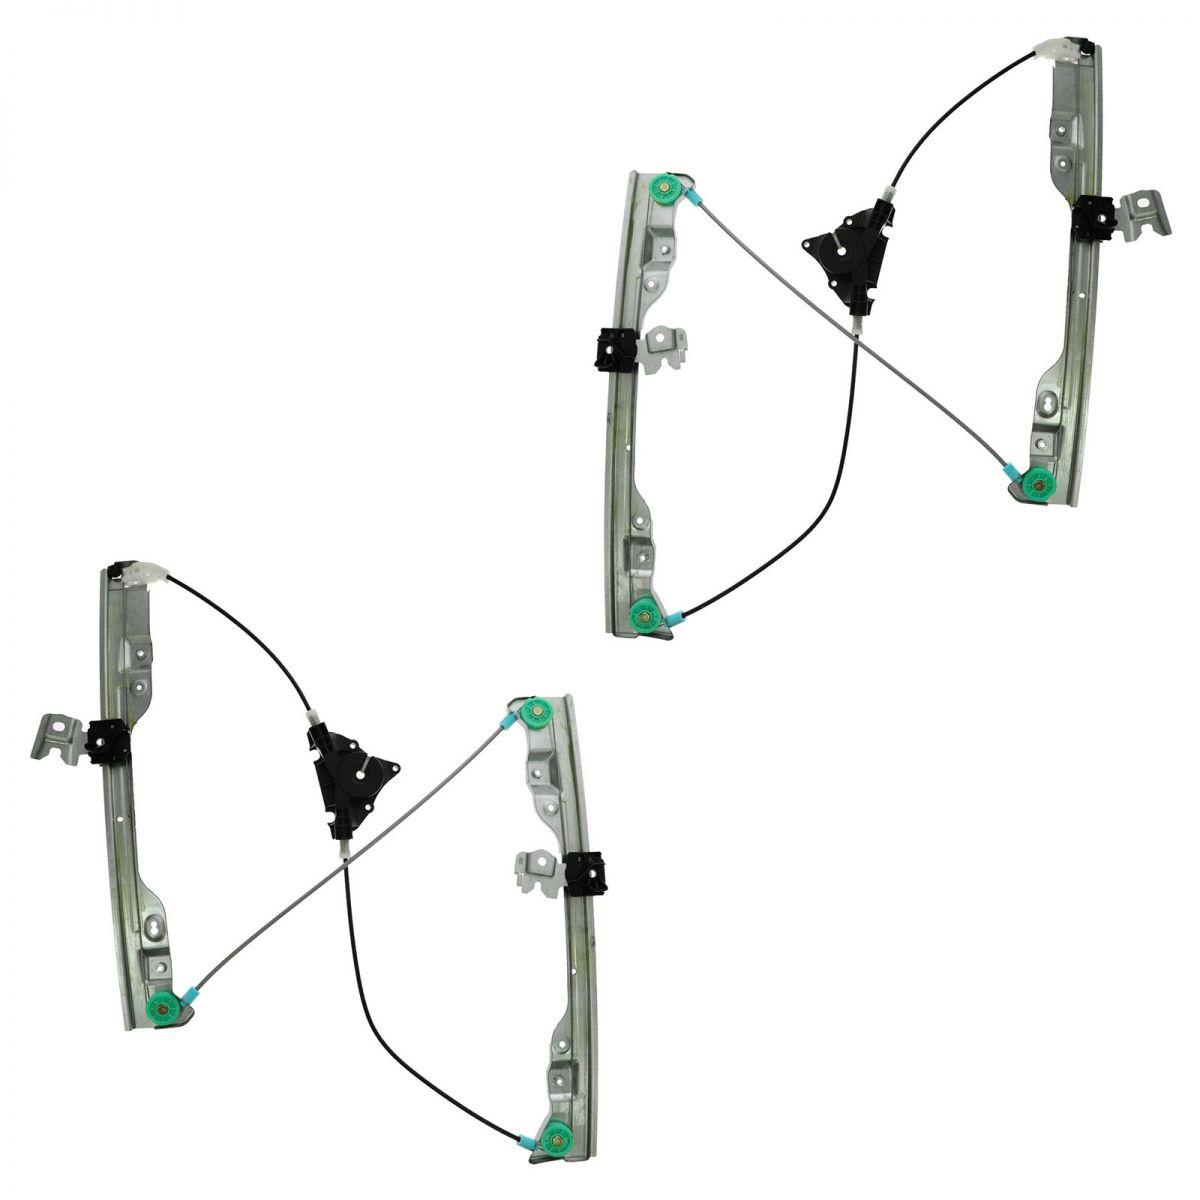 Power Window Regulator Front Pair Set of 2 LH & RH for 07